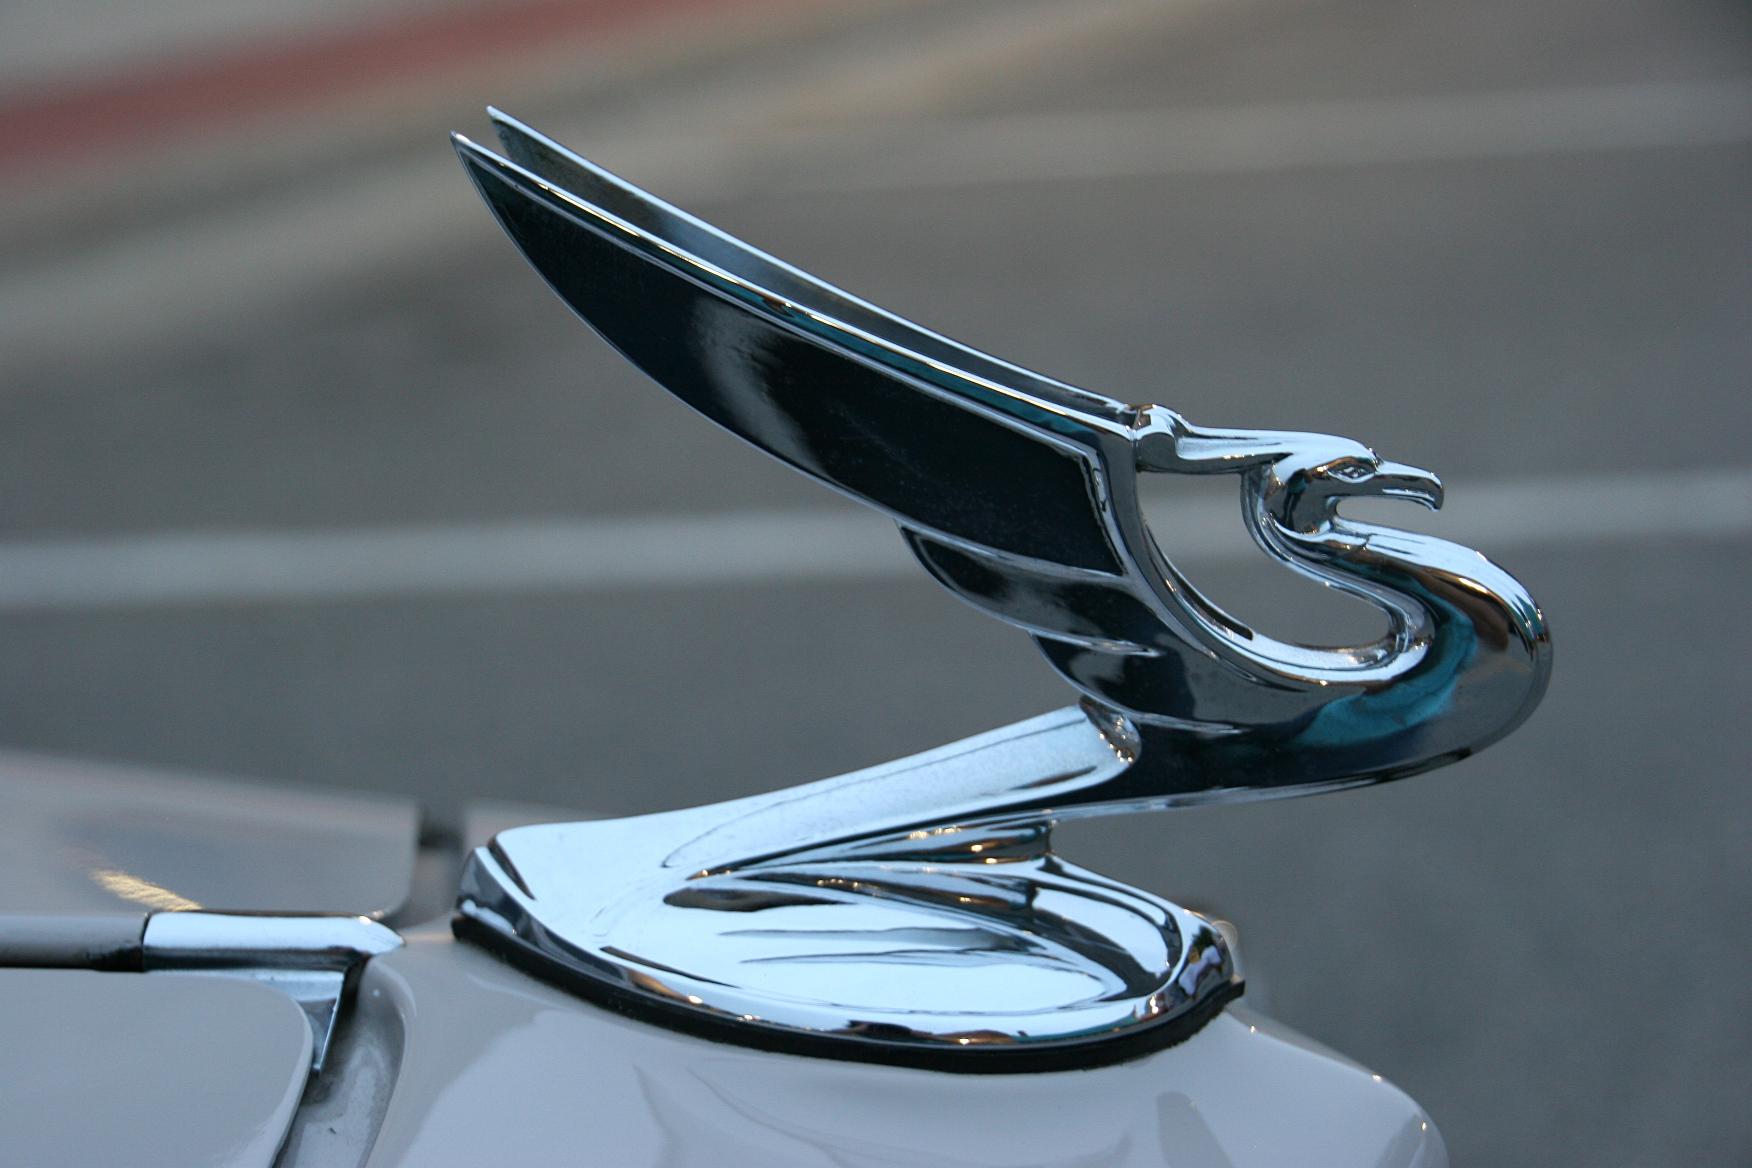 Falcon hood ornament - Hood Ornaments Always Interest Me For Their Artsy Beauty